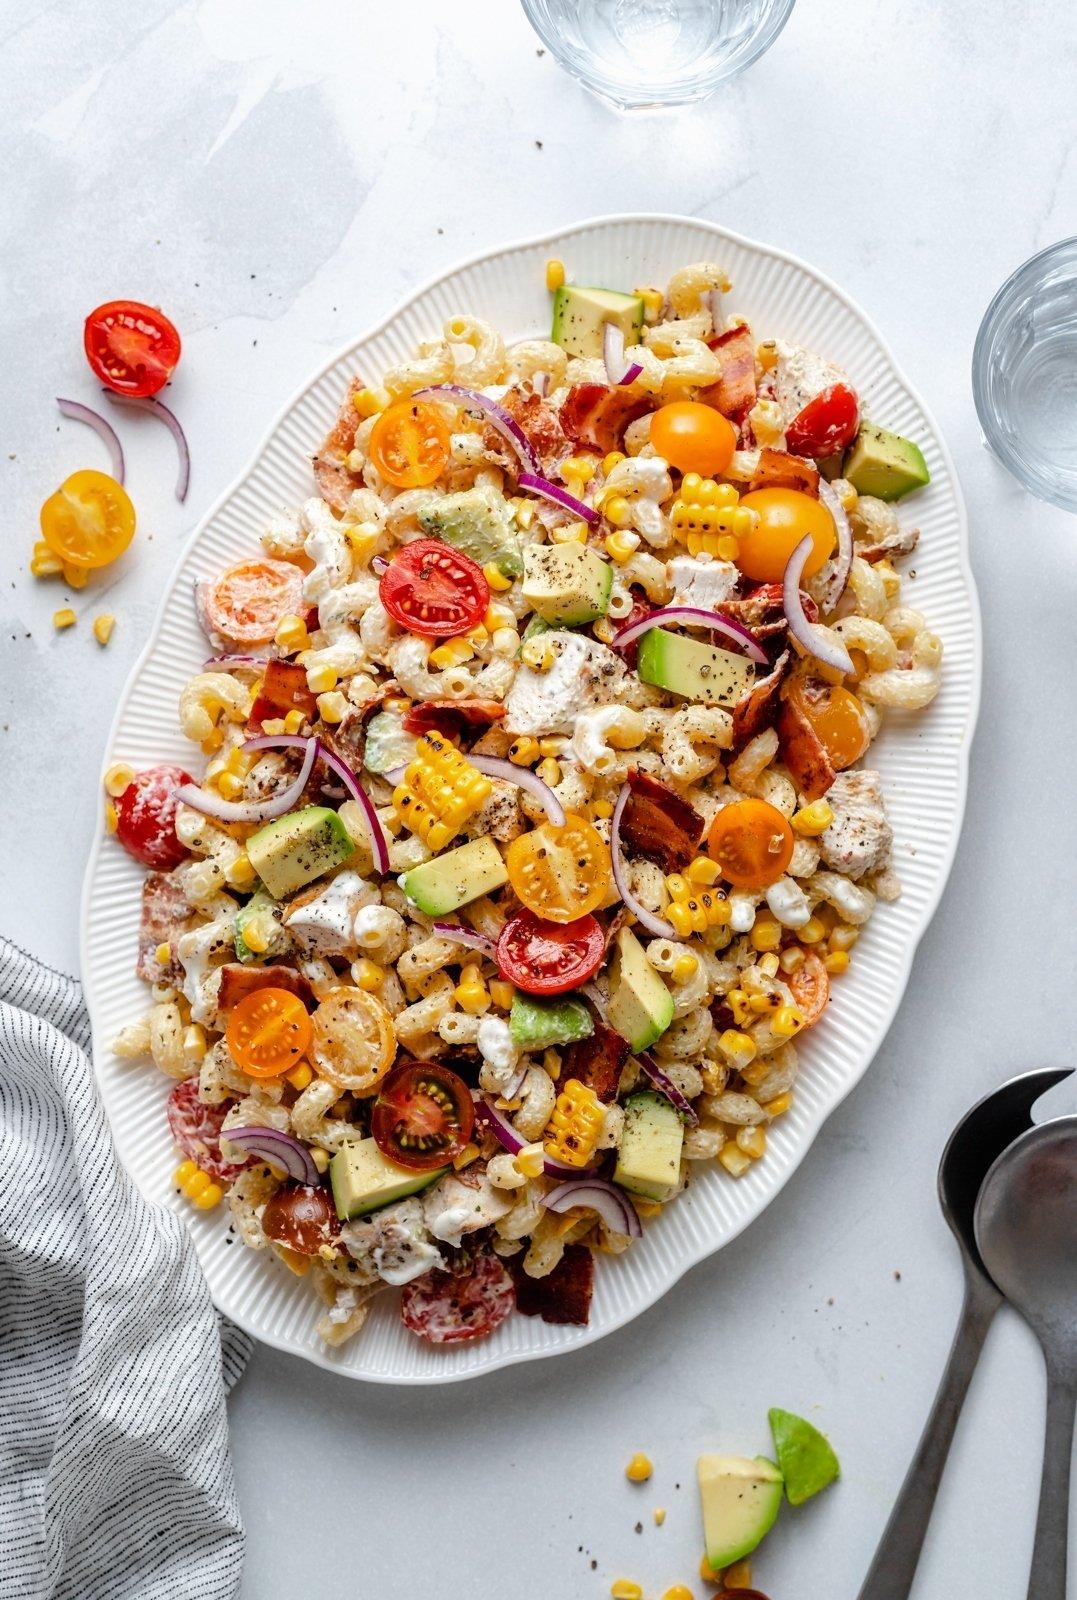 healthy chicken bacon pasta salad on a platter